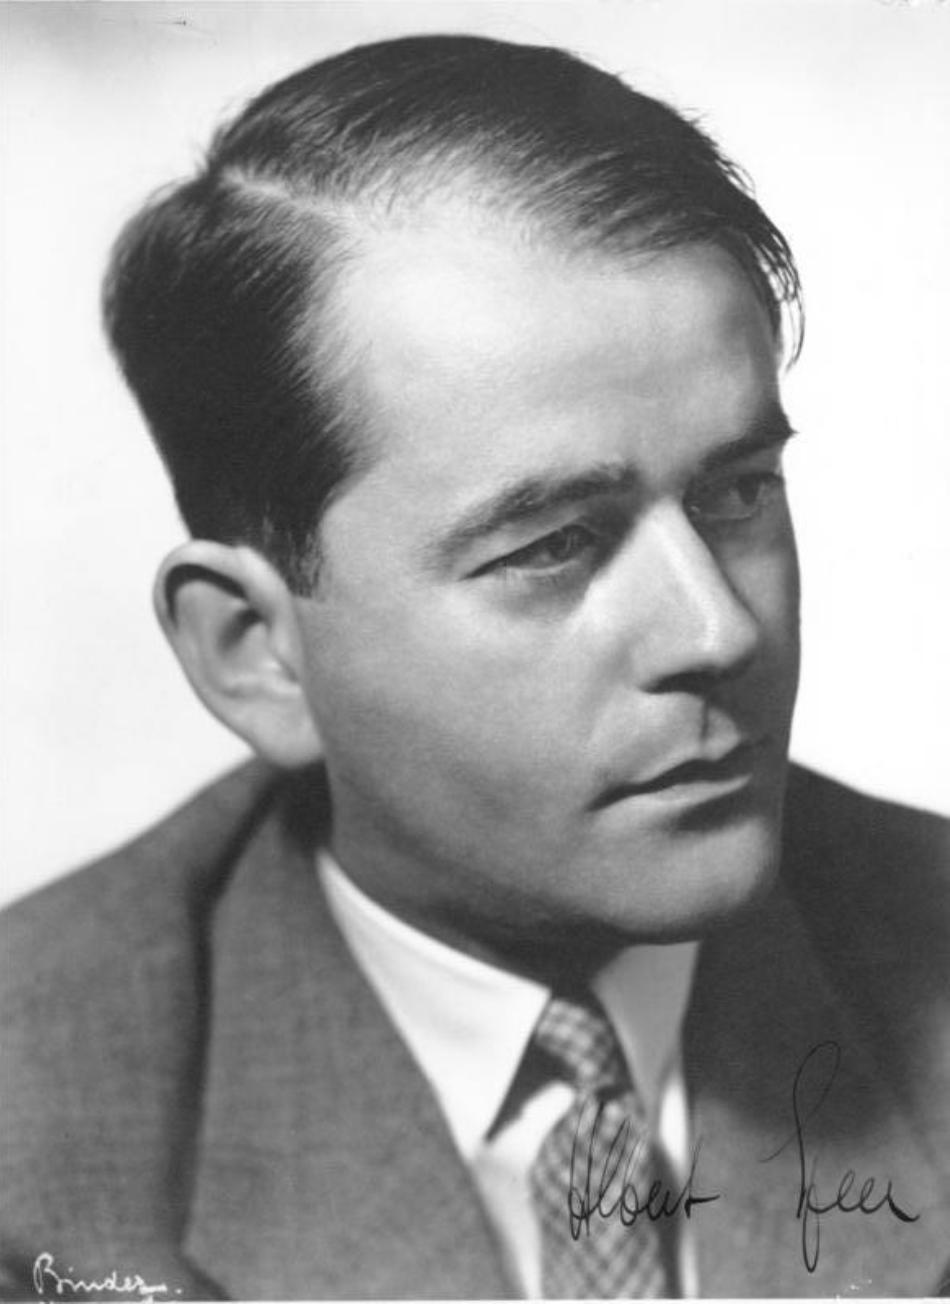 Albert Speer în anii tinereţii sale.